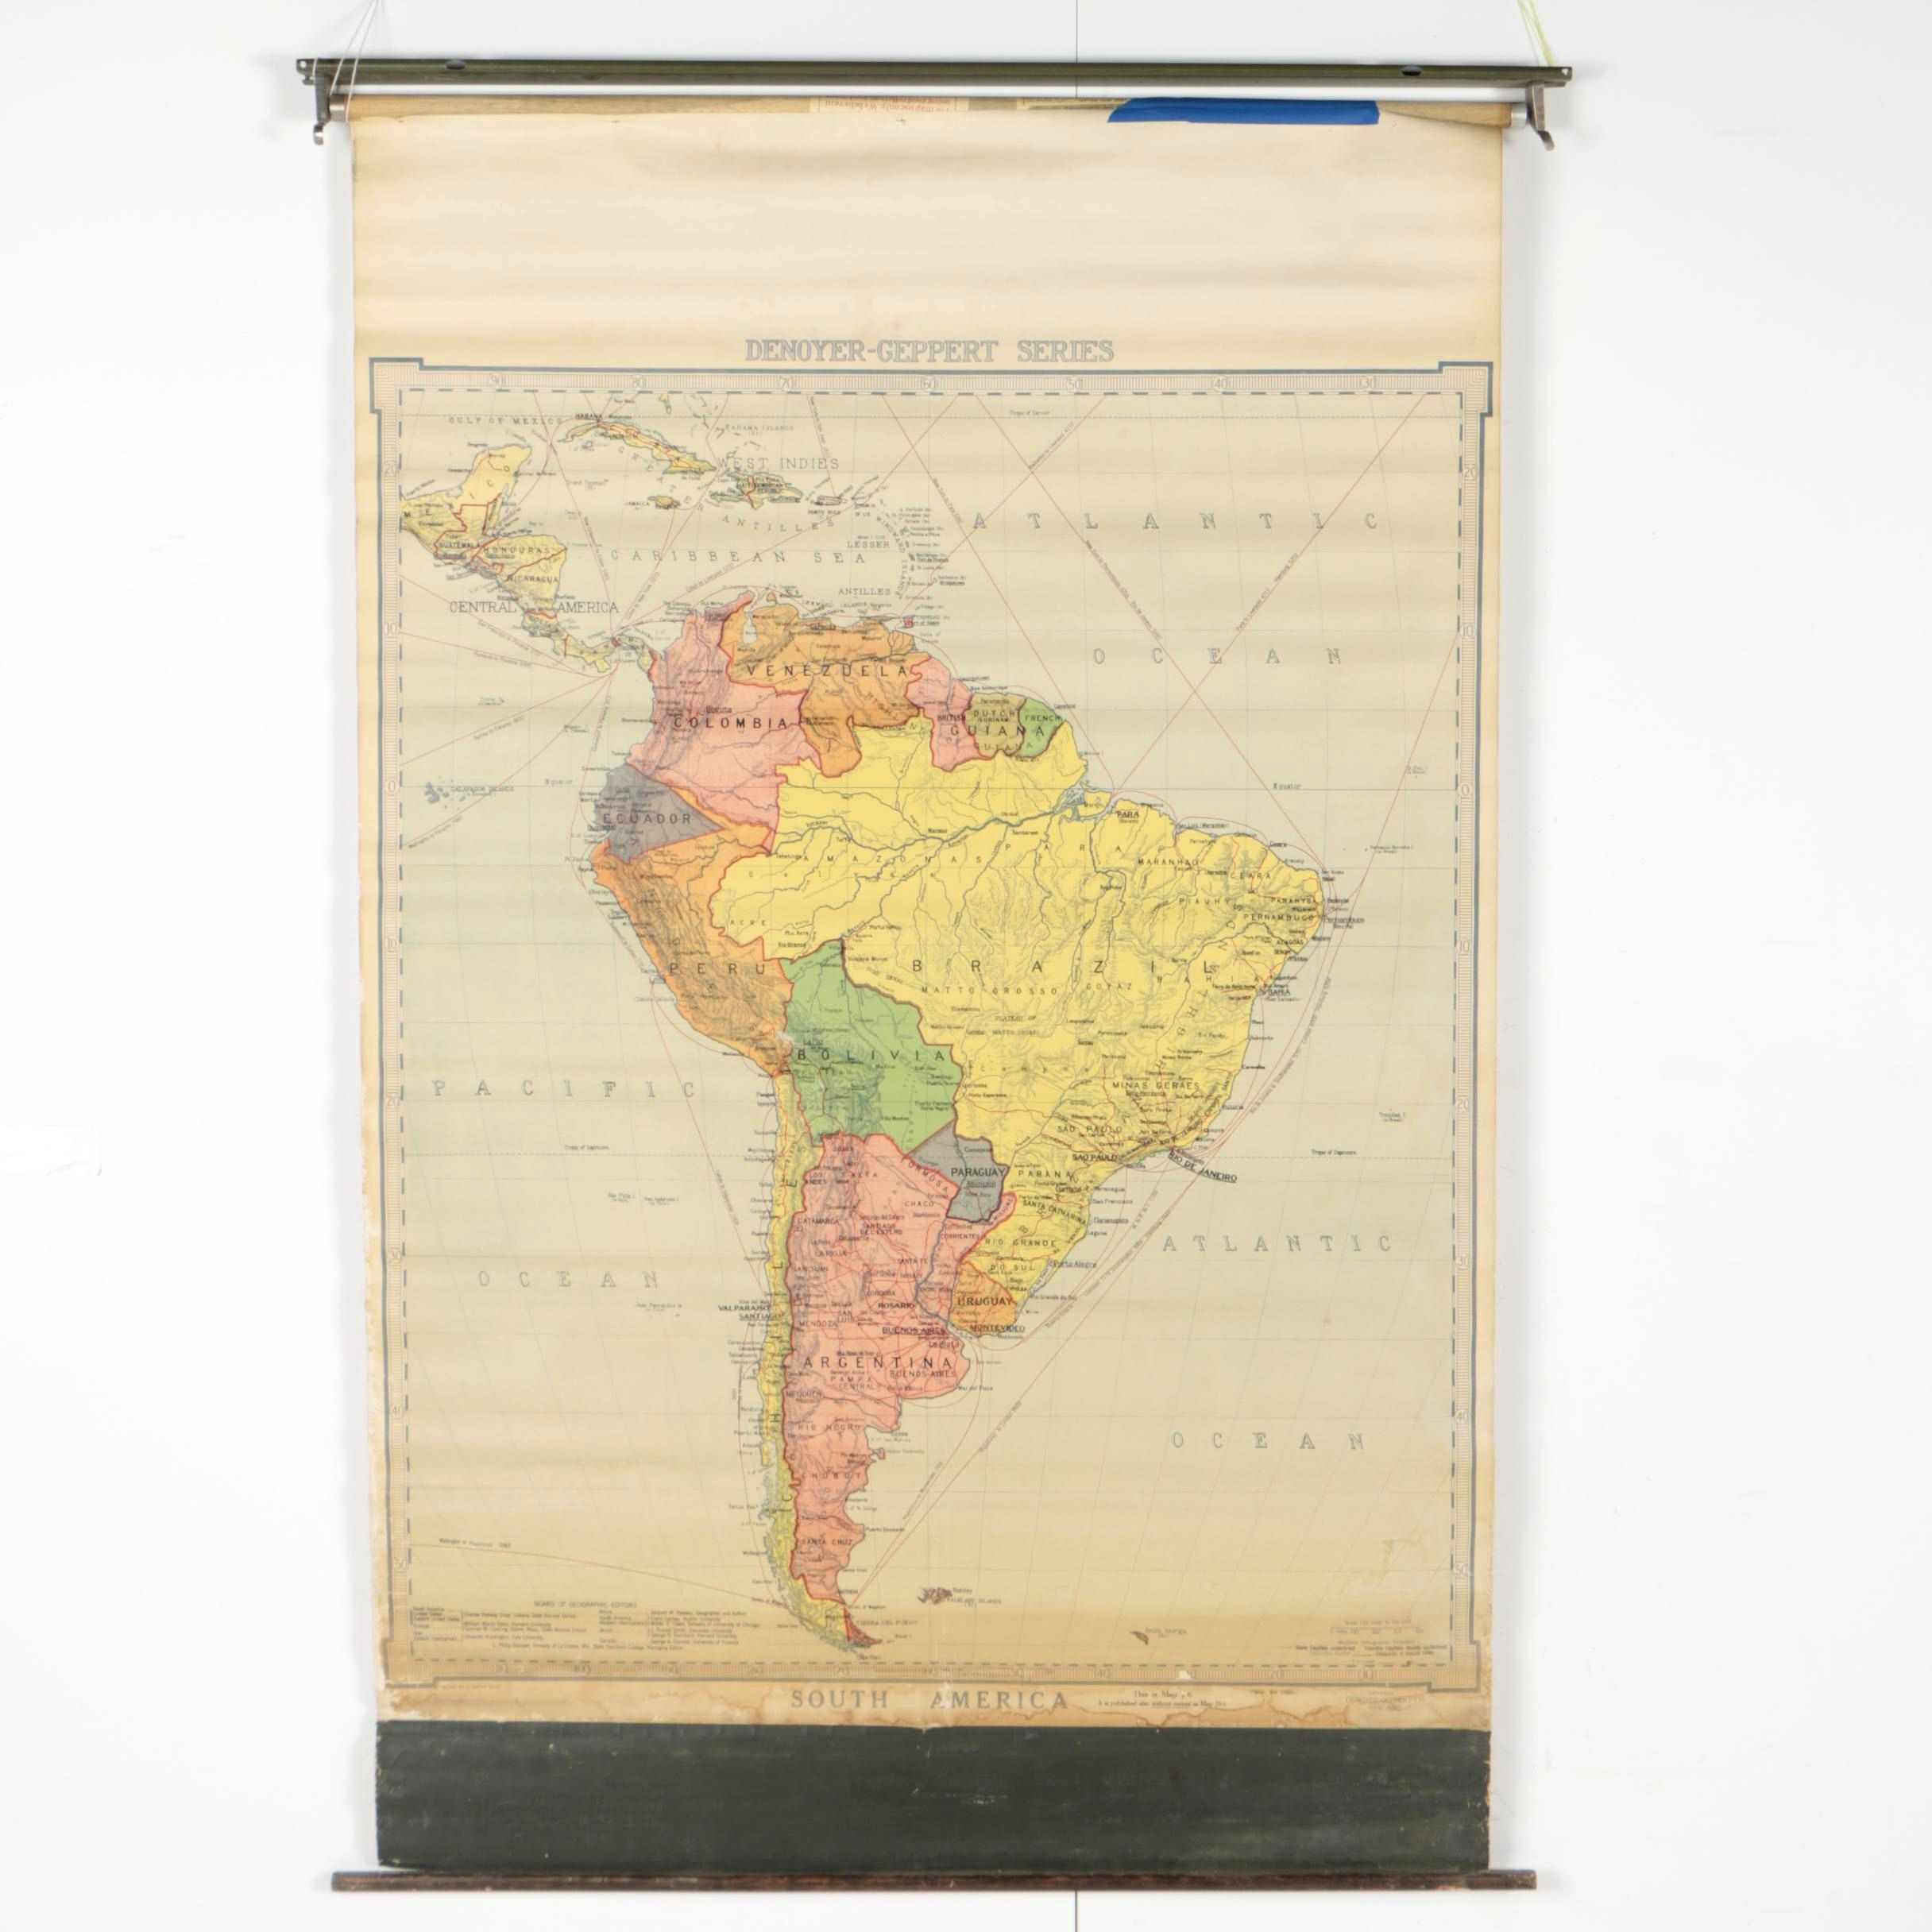 Denoyer-Geppert School Map of South America